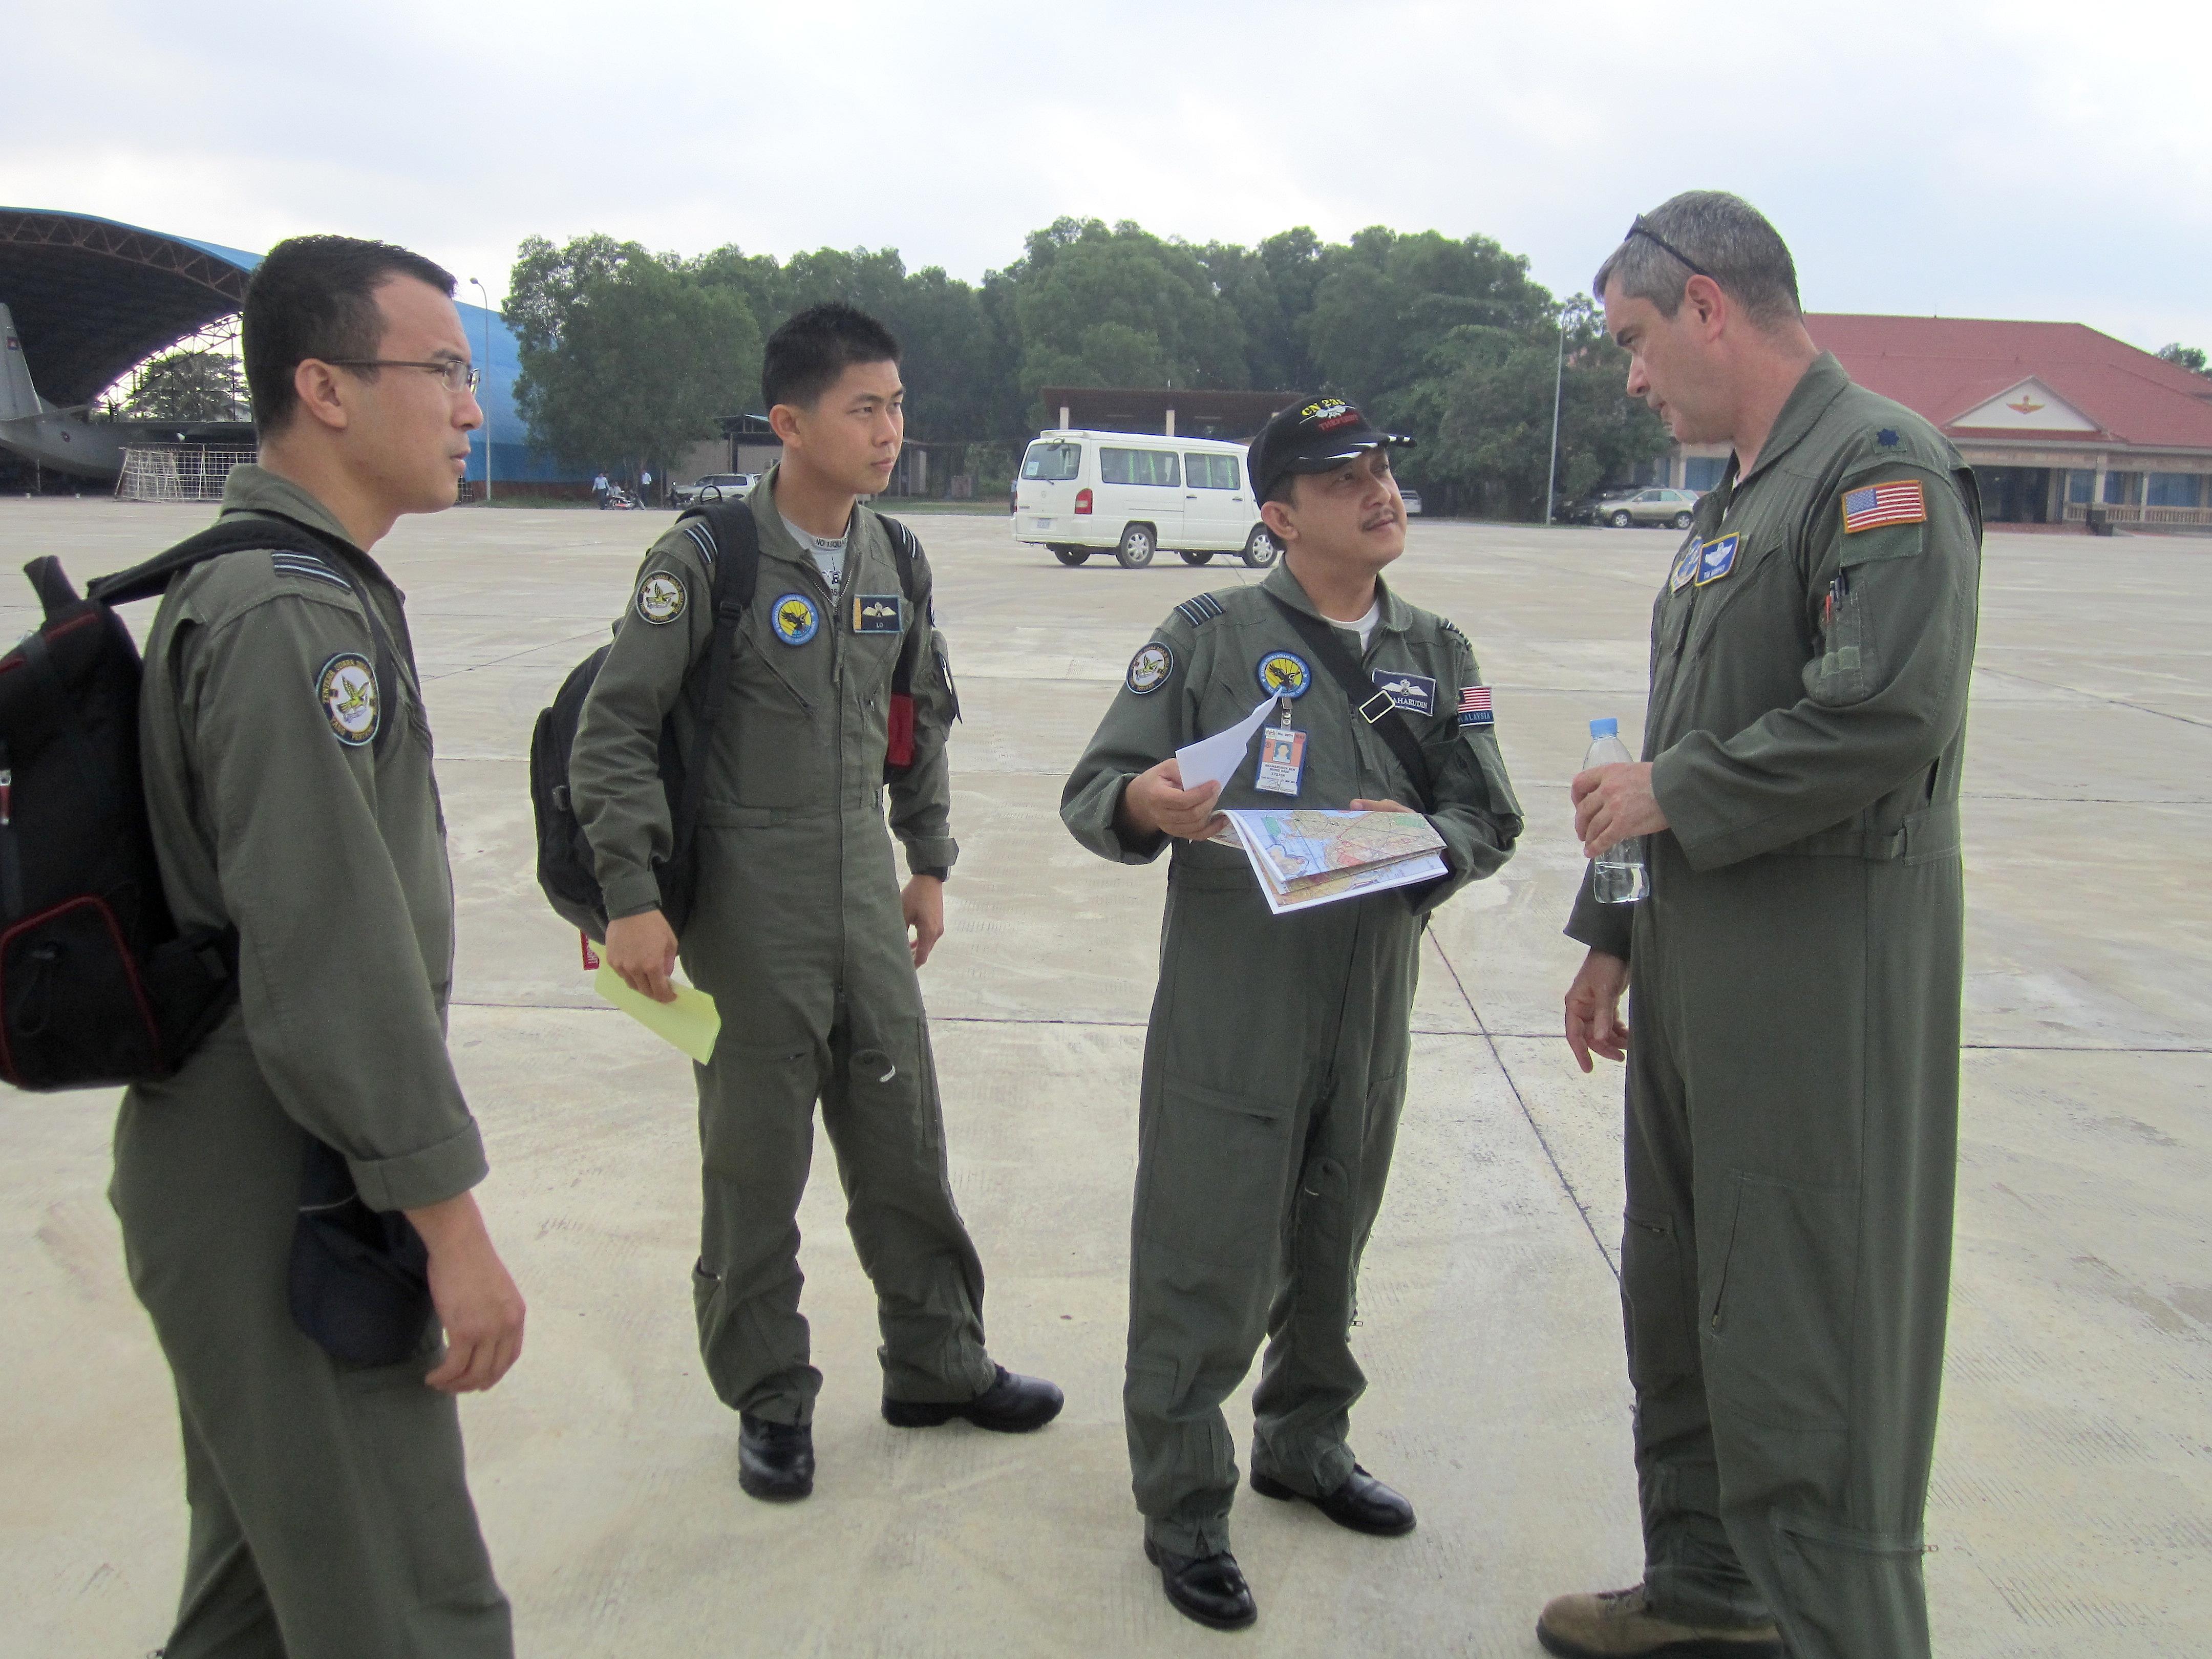 File:U.S. Air Force Lt. Col. Tim Murphy, right, a C 130